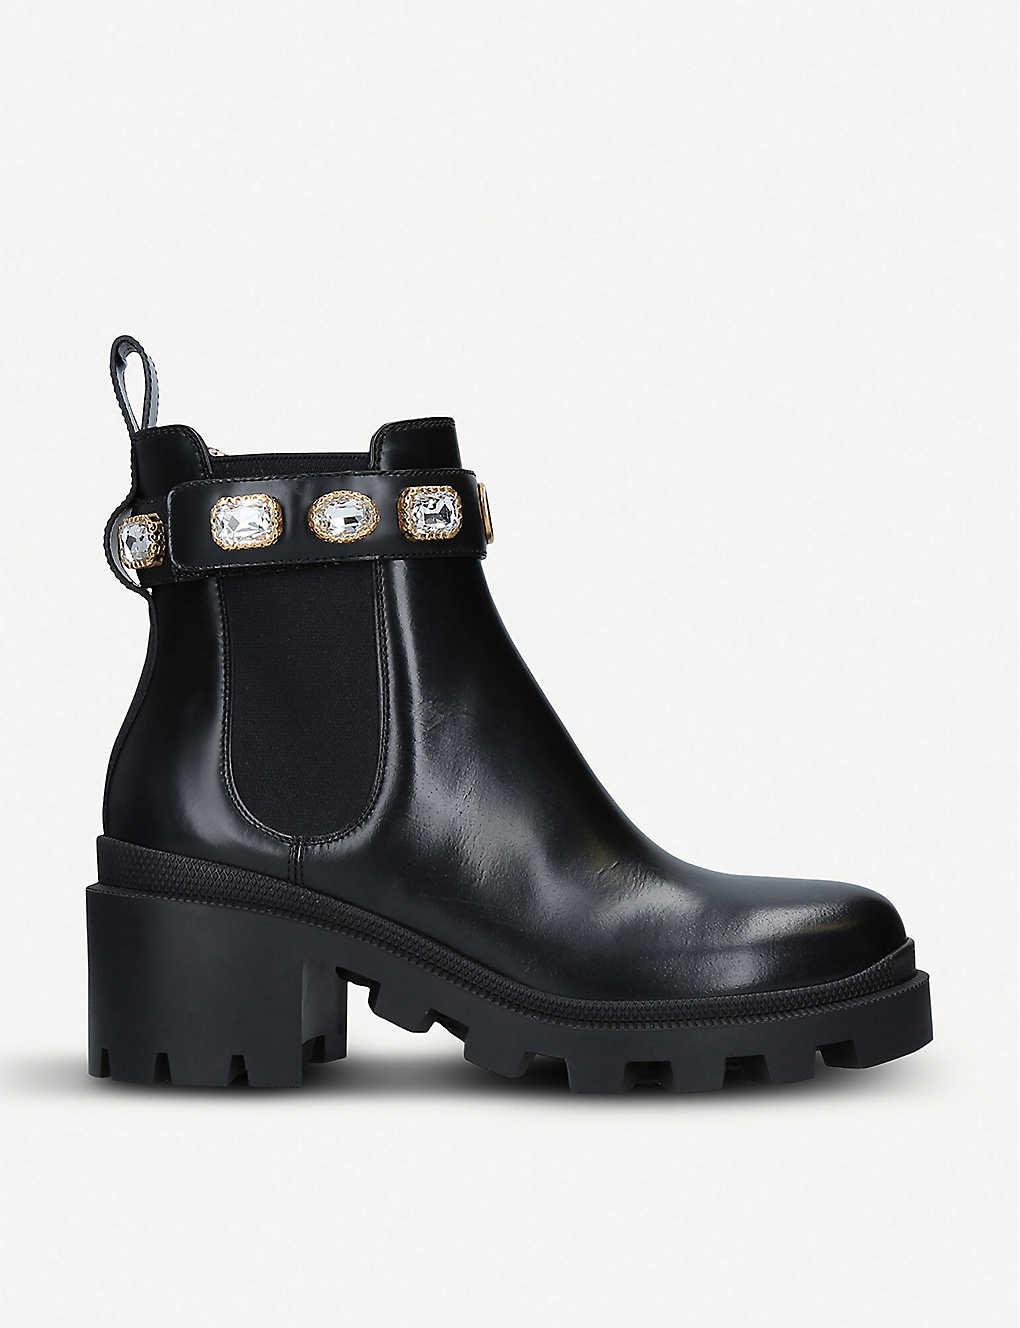 d4afa2d6a90 Trip crystal-embellished leather Chelsea boots - Black ...